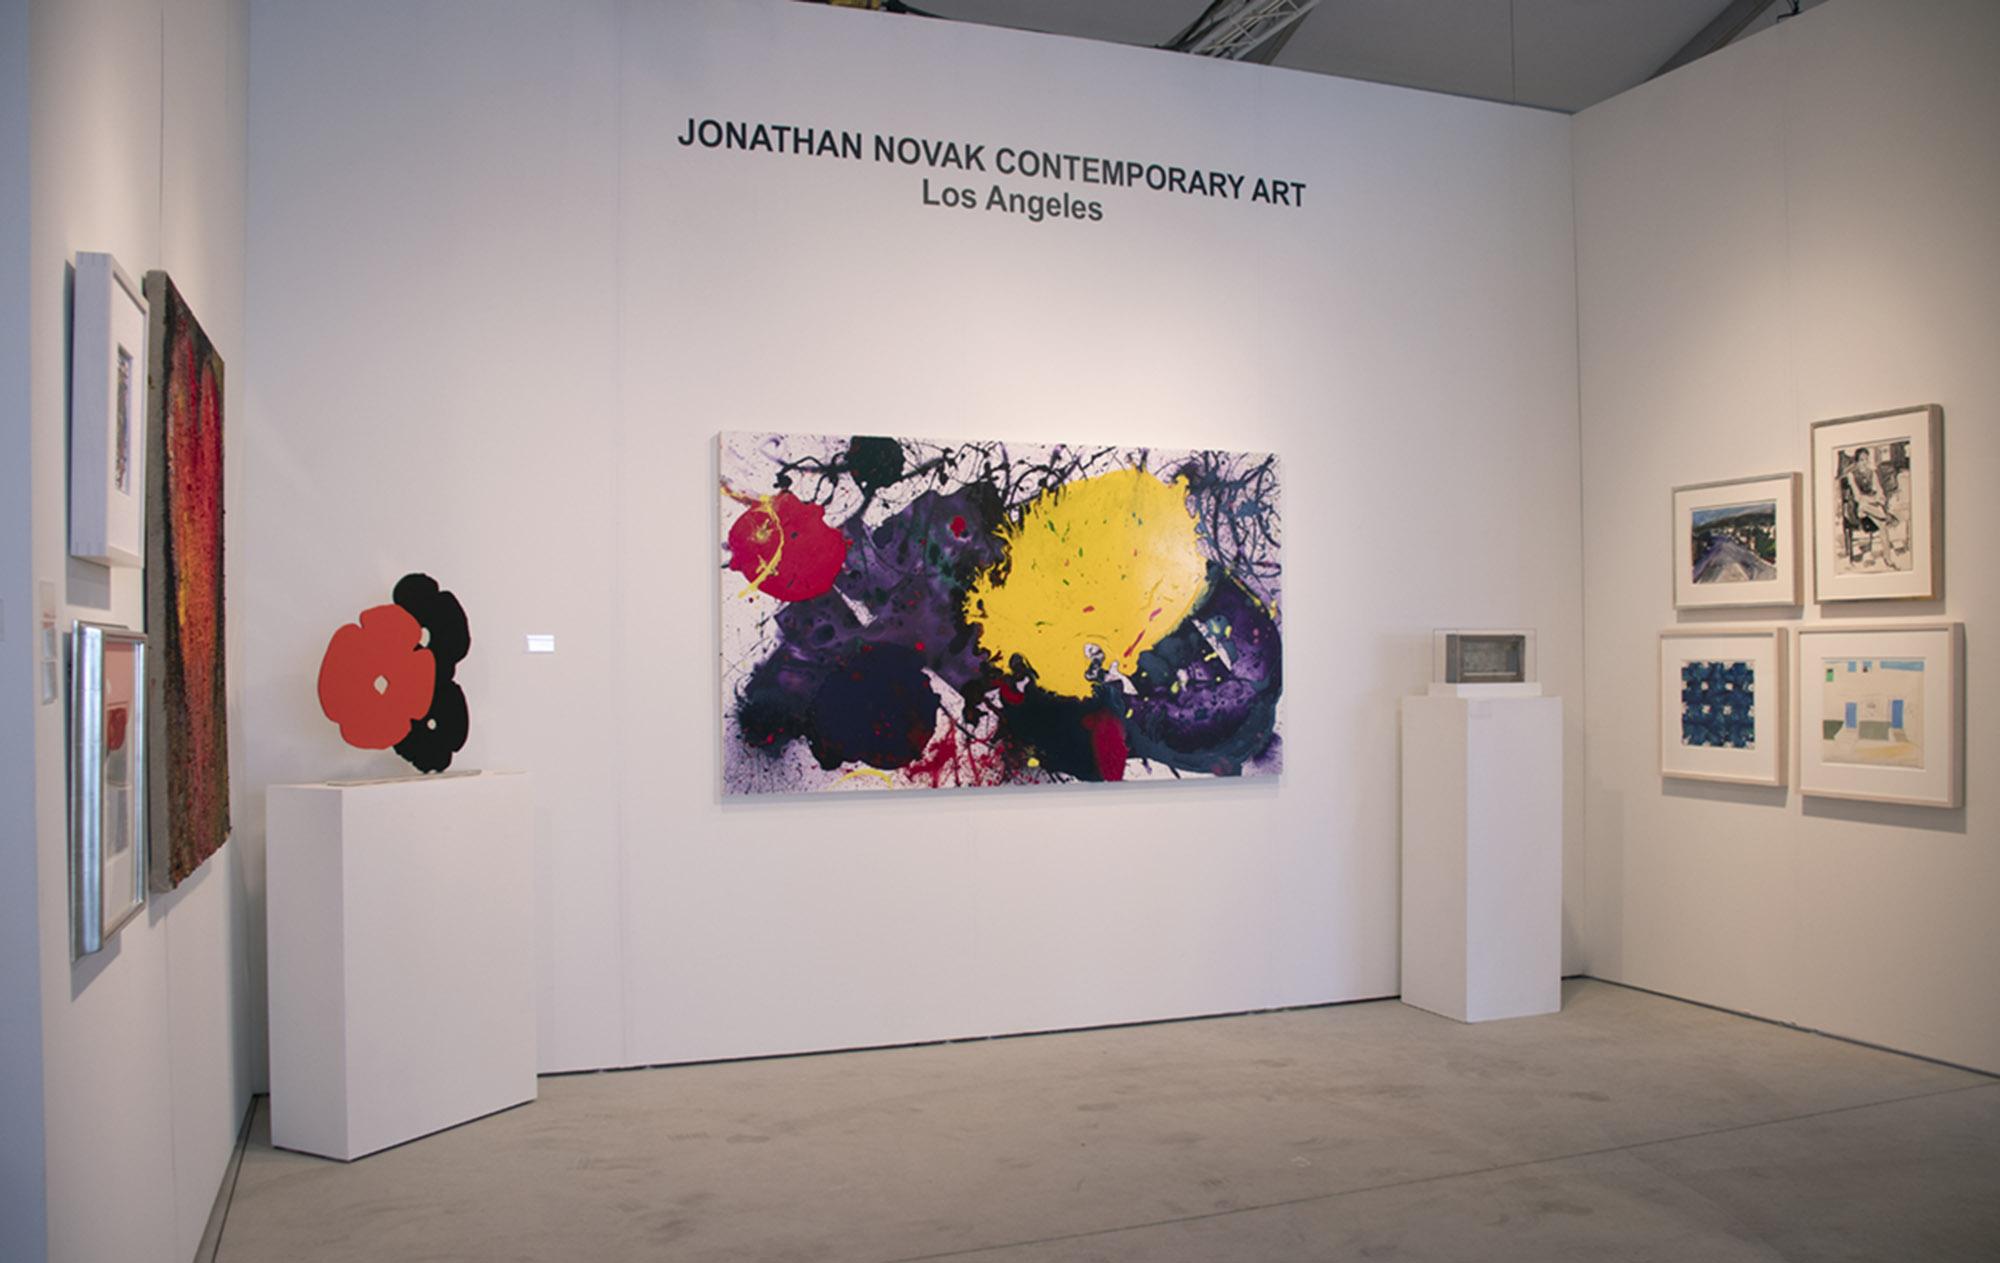 Art Miami 2018 booth photo